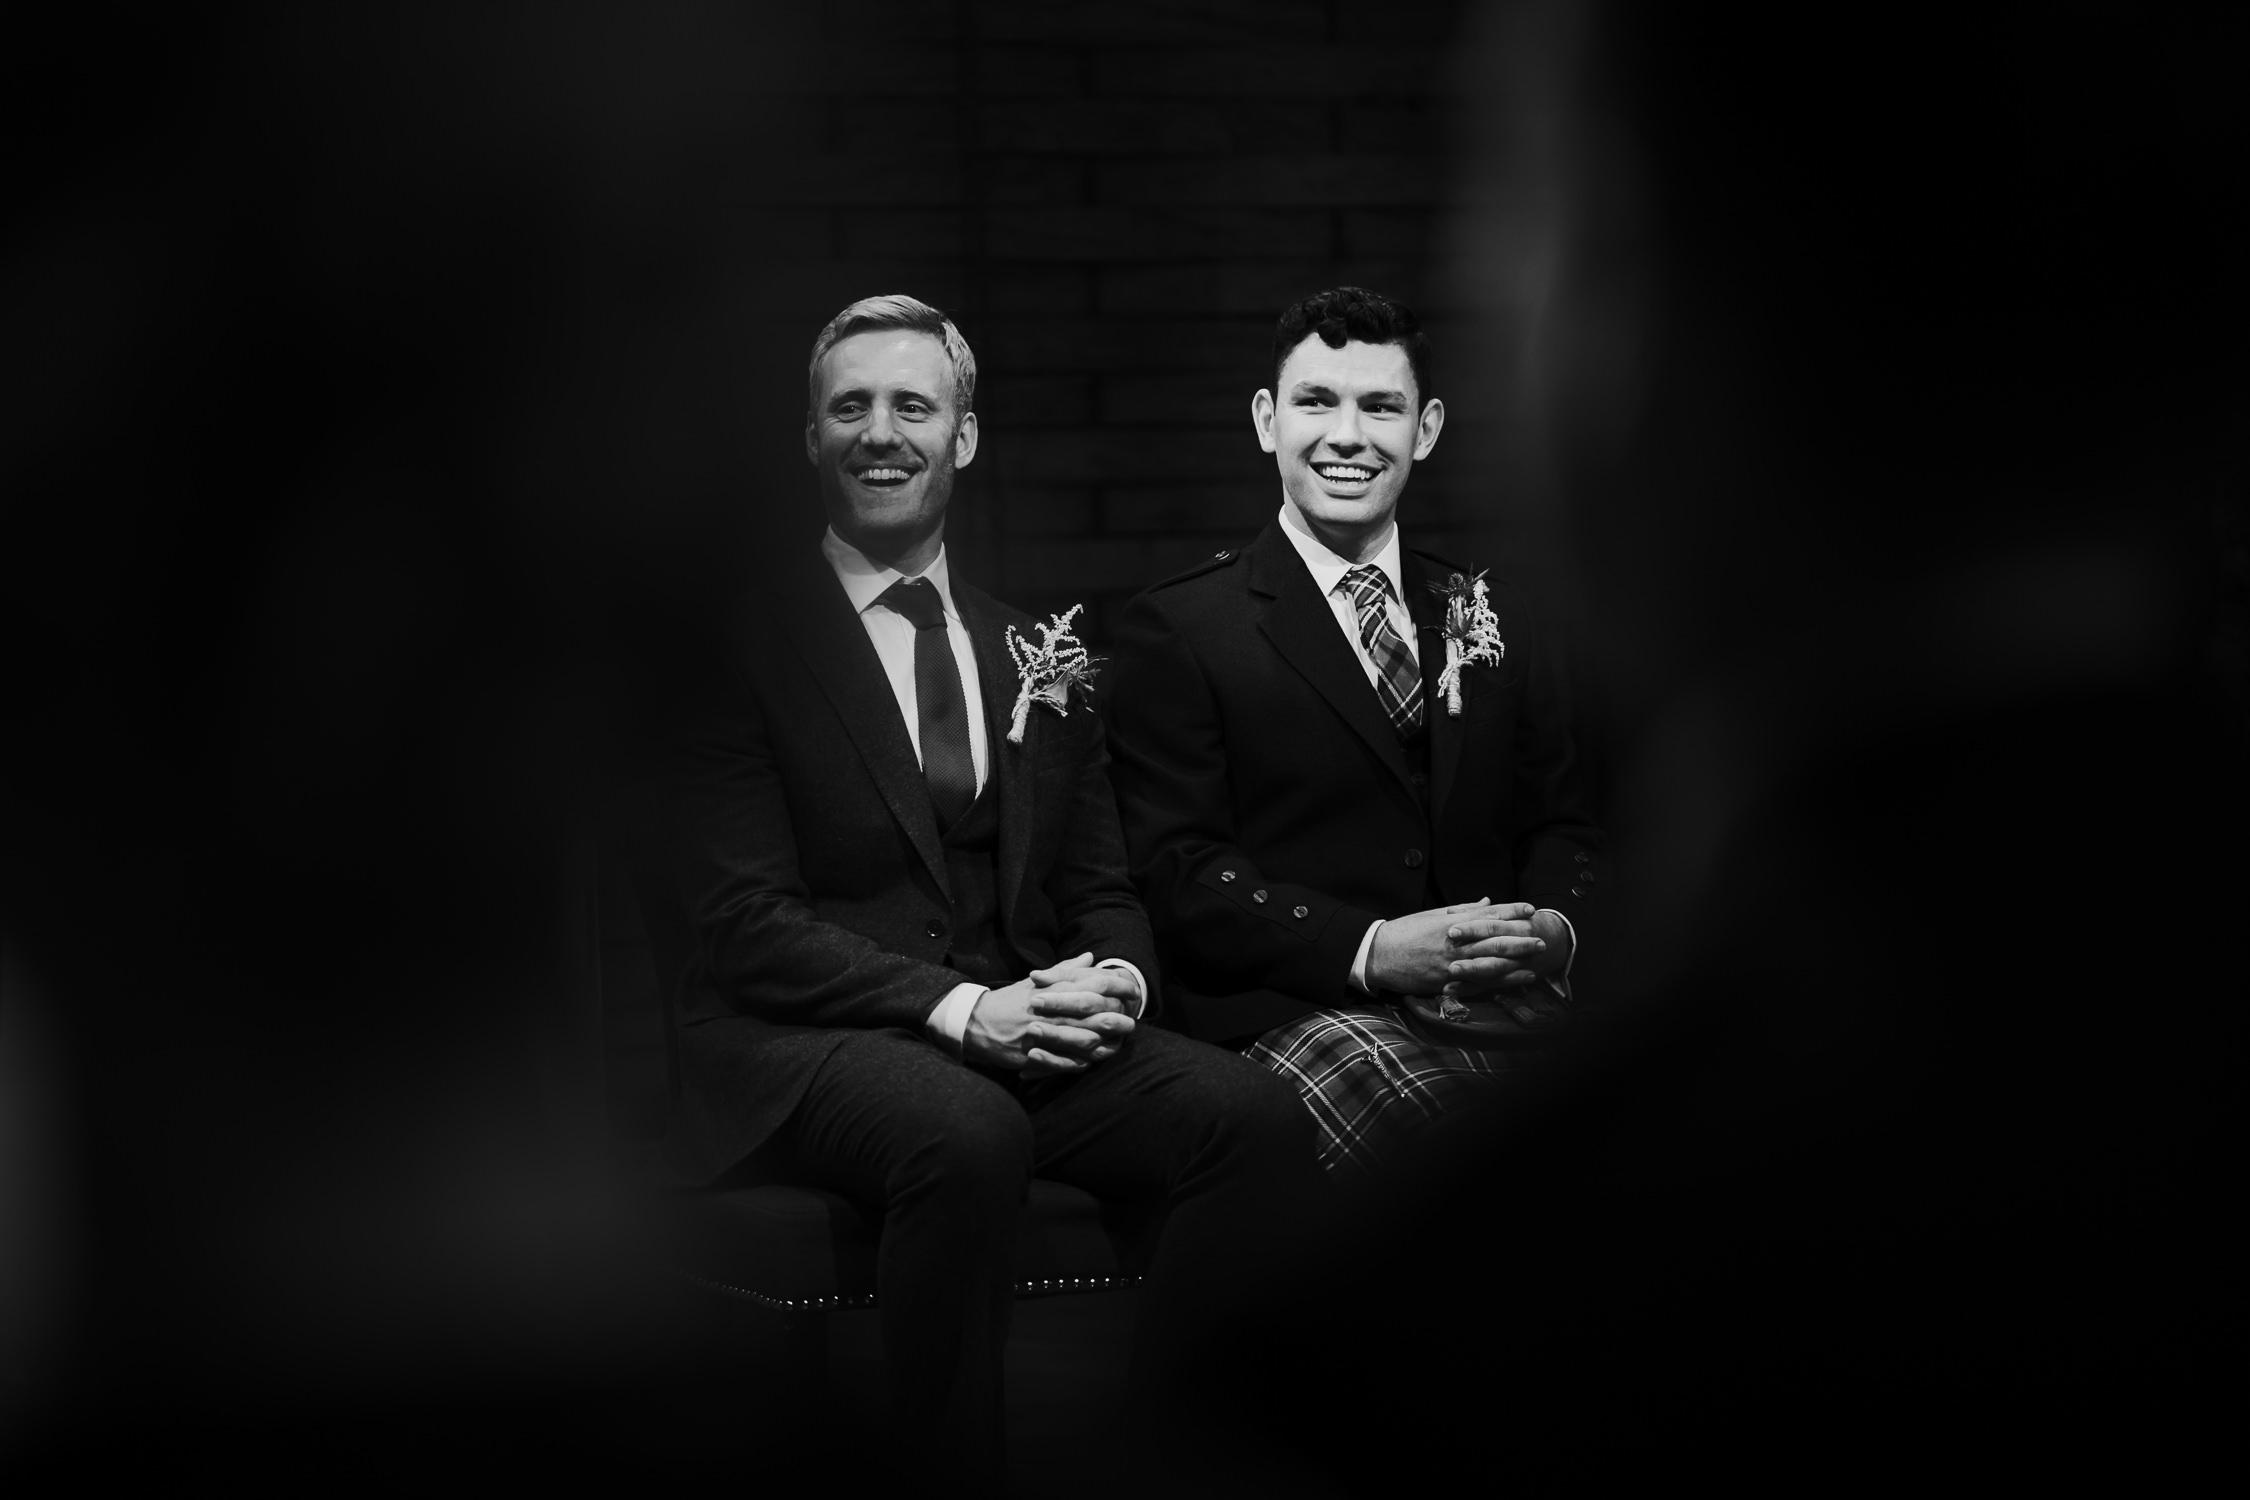 amsterdam-wedding-photographer-trouwfotograaf-bruidsfotograaf-mark-hadden-bruidsfotografie-David & Ronald-158-2.jpg